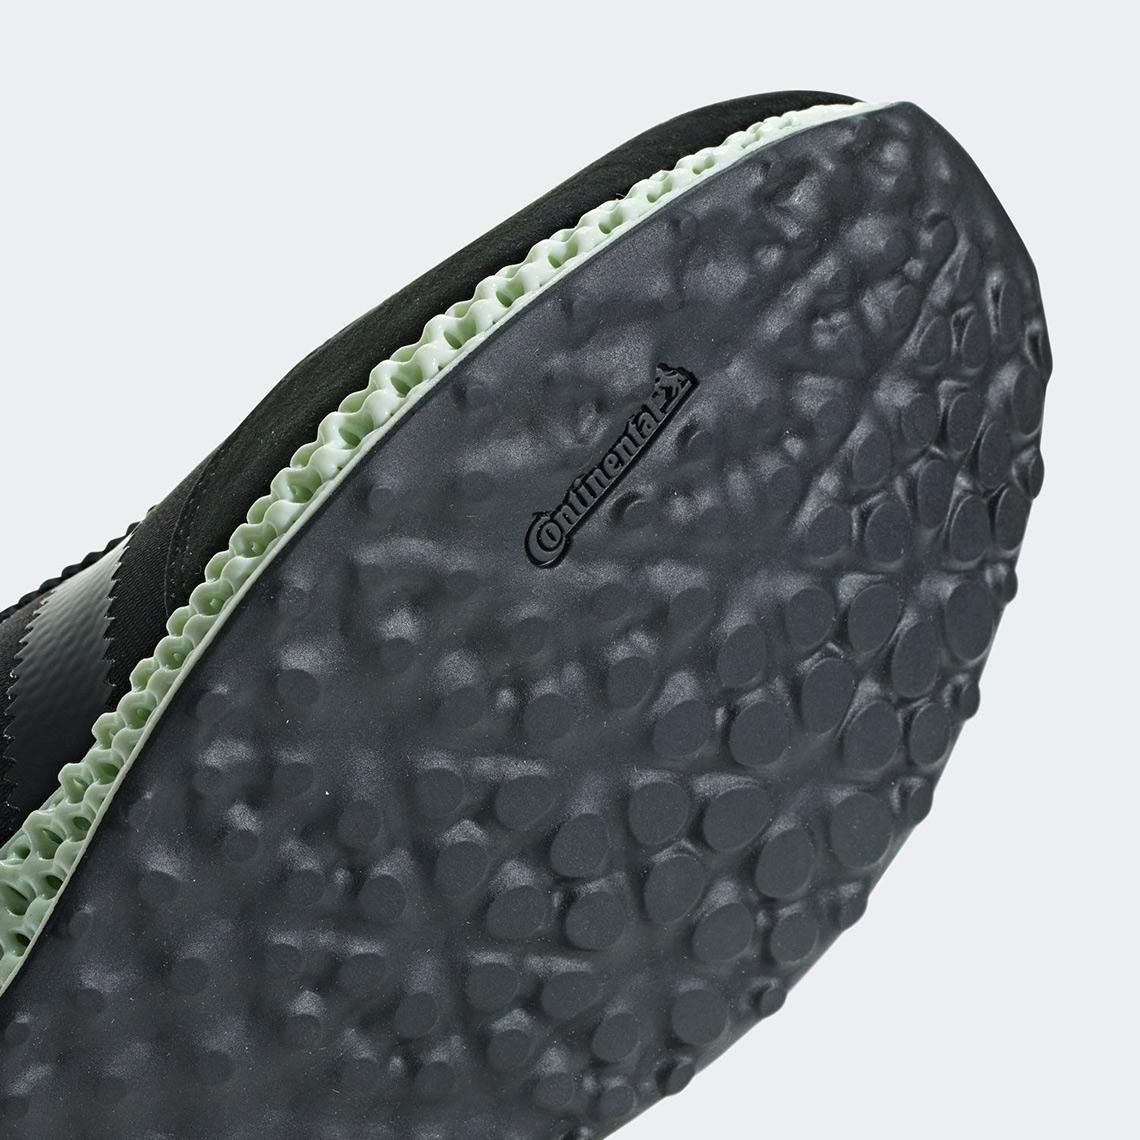 f5c3847718ed0 adidas Futurecraft 4d-5923 Release Info